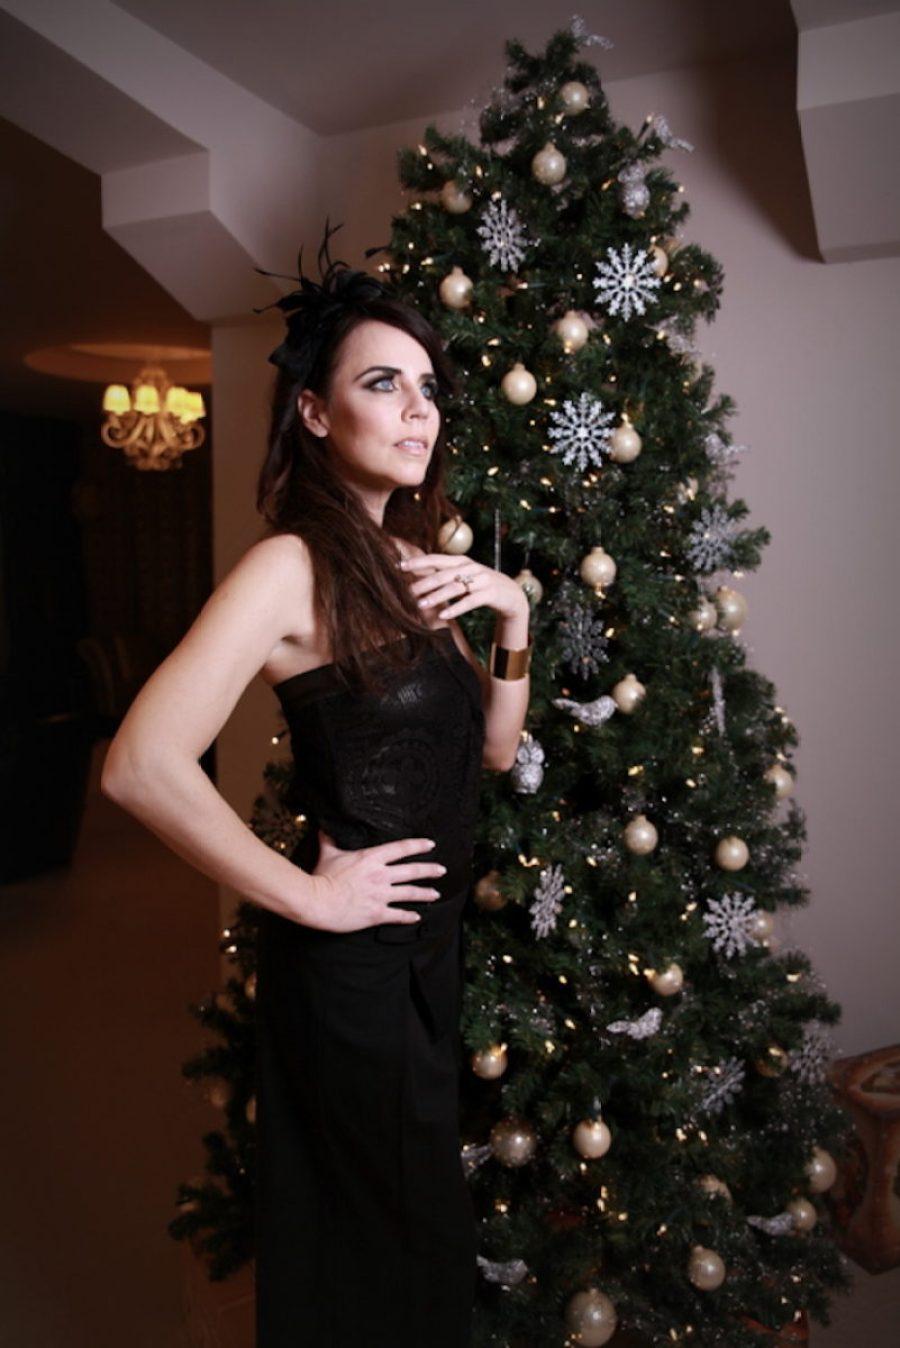 Photo and make-up Biljana Babic